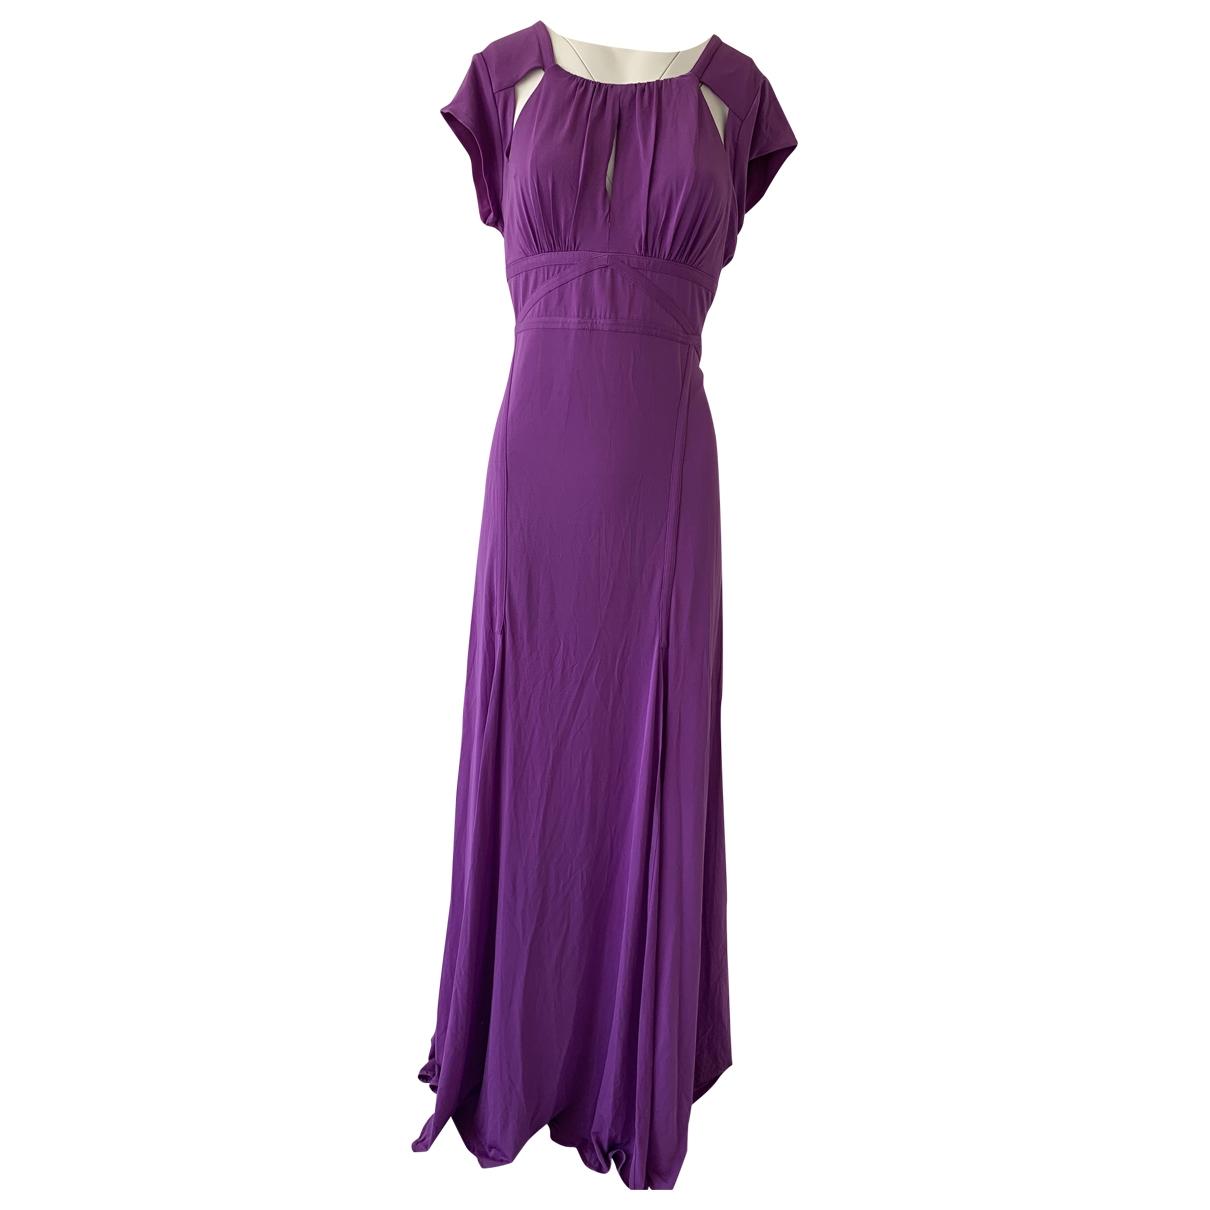 Bcbg Max Azria \N Kleid in  Lila Polyester